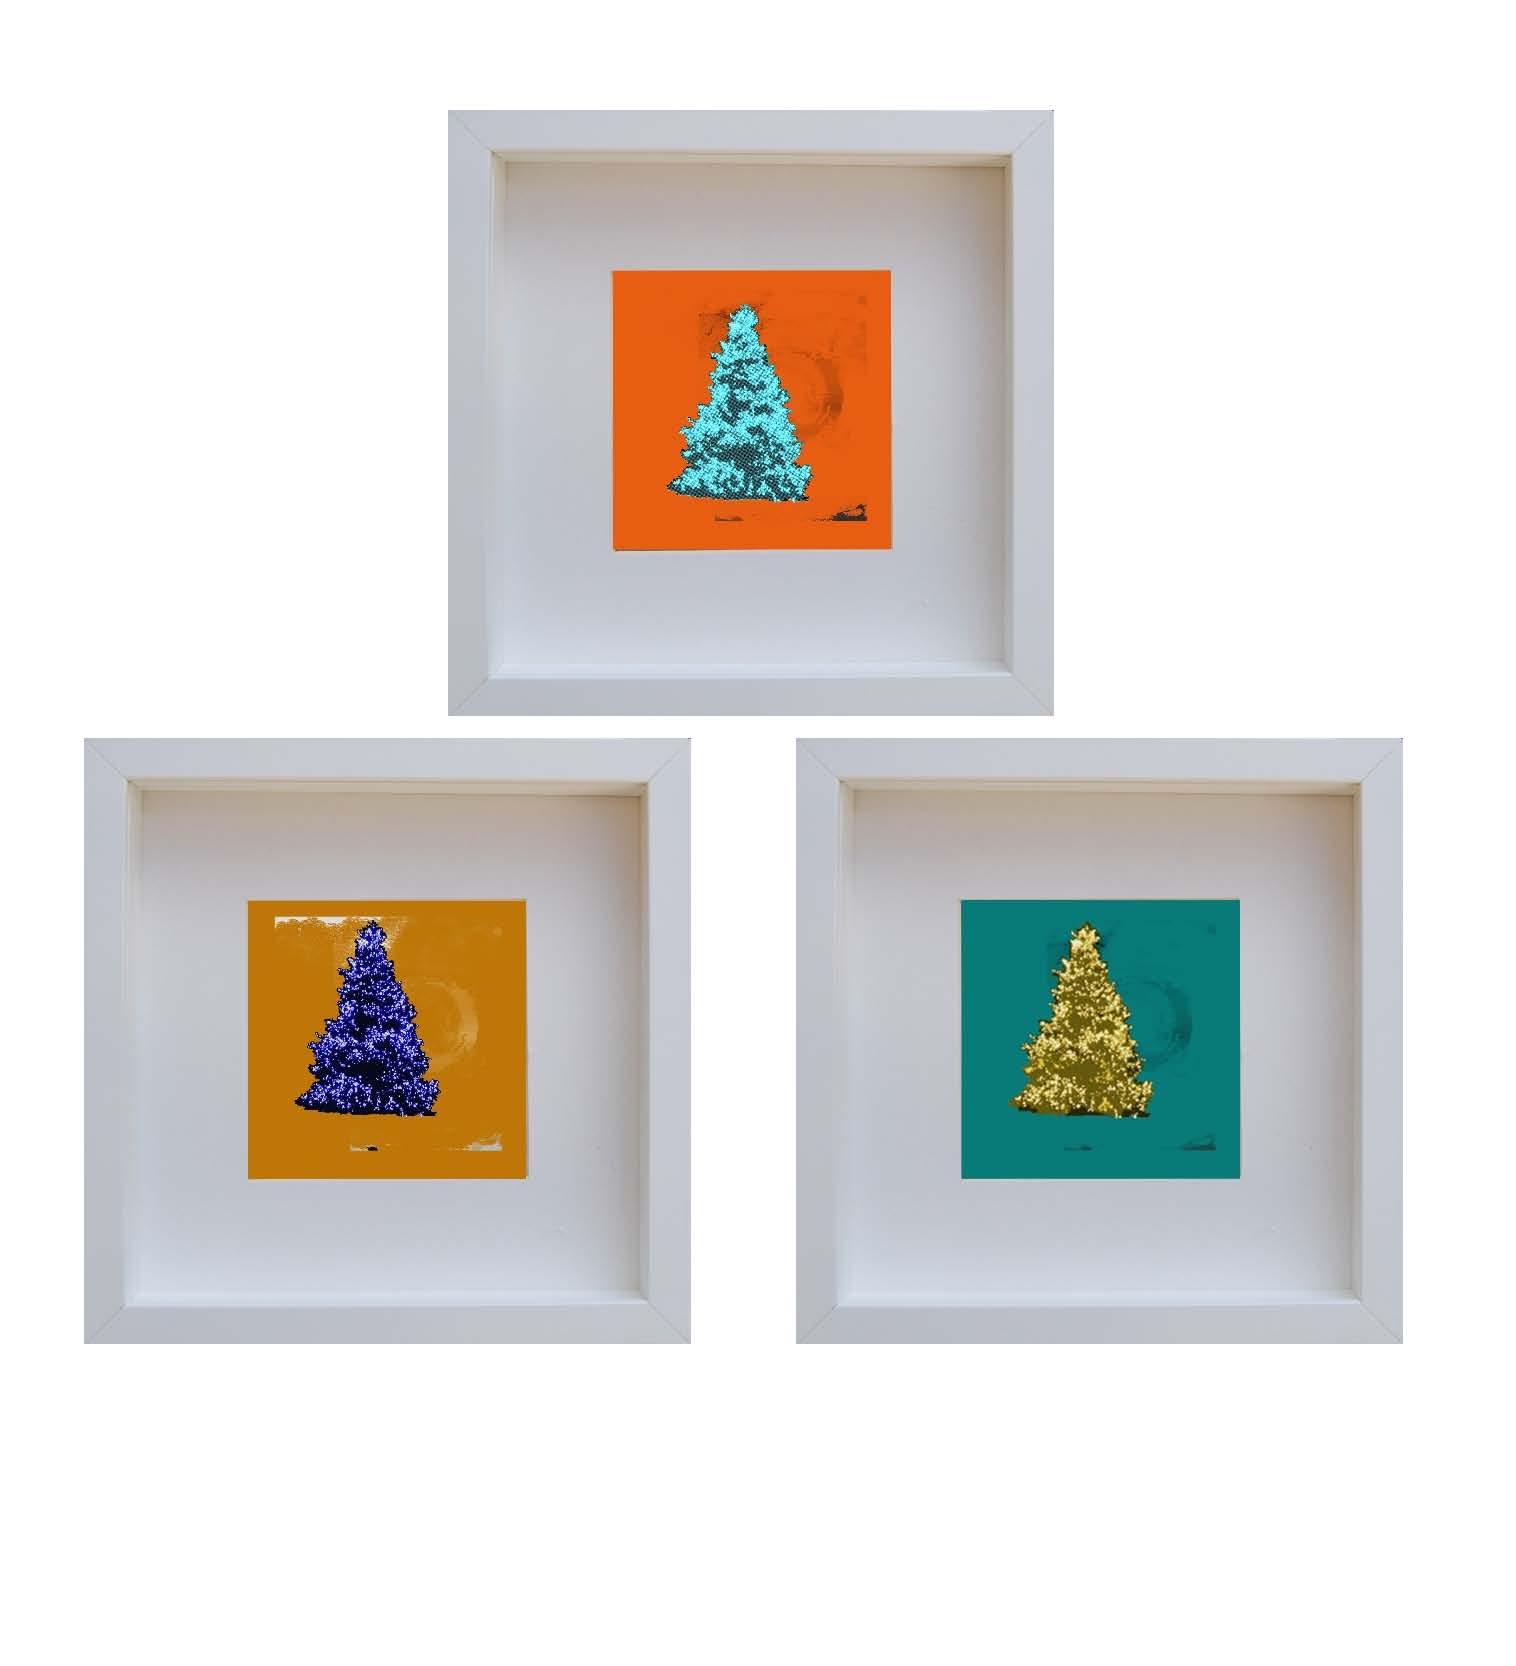 Weihnachtsbaum Tradition.Weihnachtsbaum Tradition